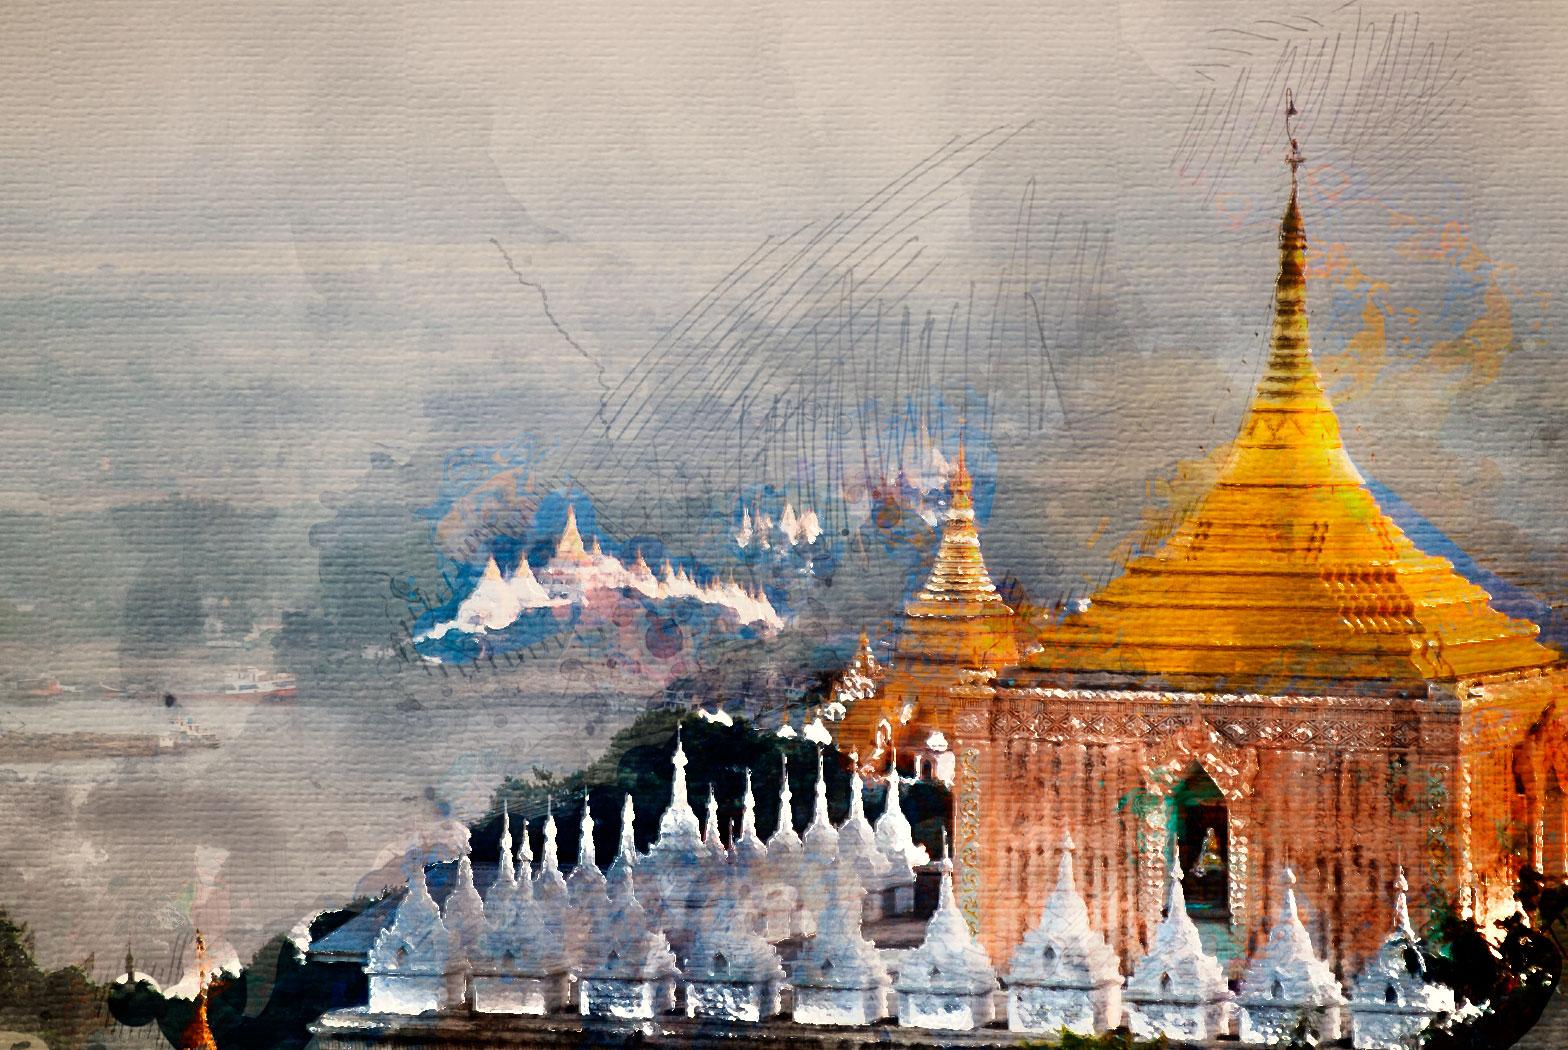 Viaje recomendado a Myanmar – Soñé con mil estupas de oro